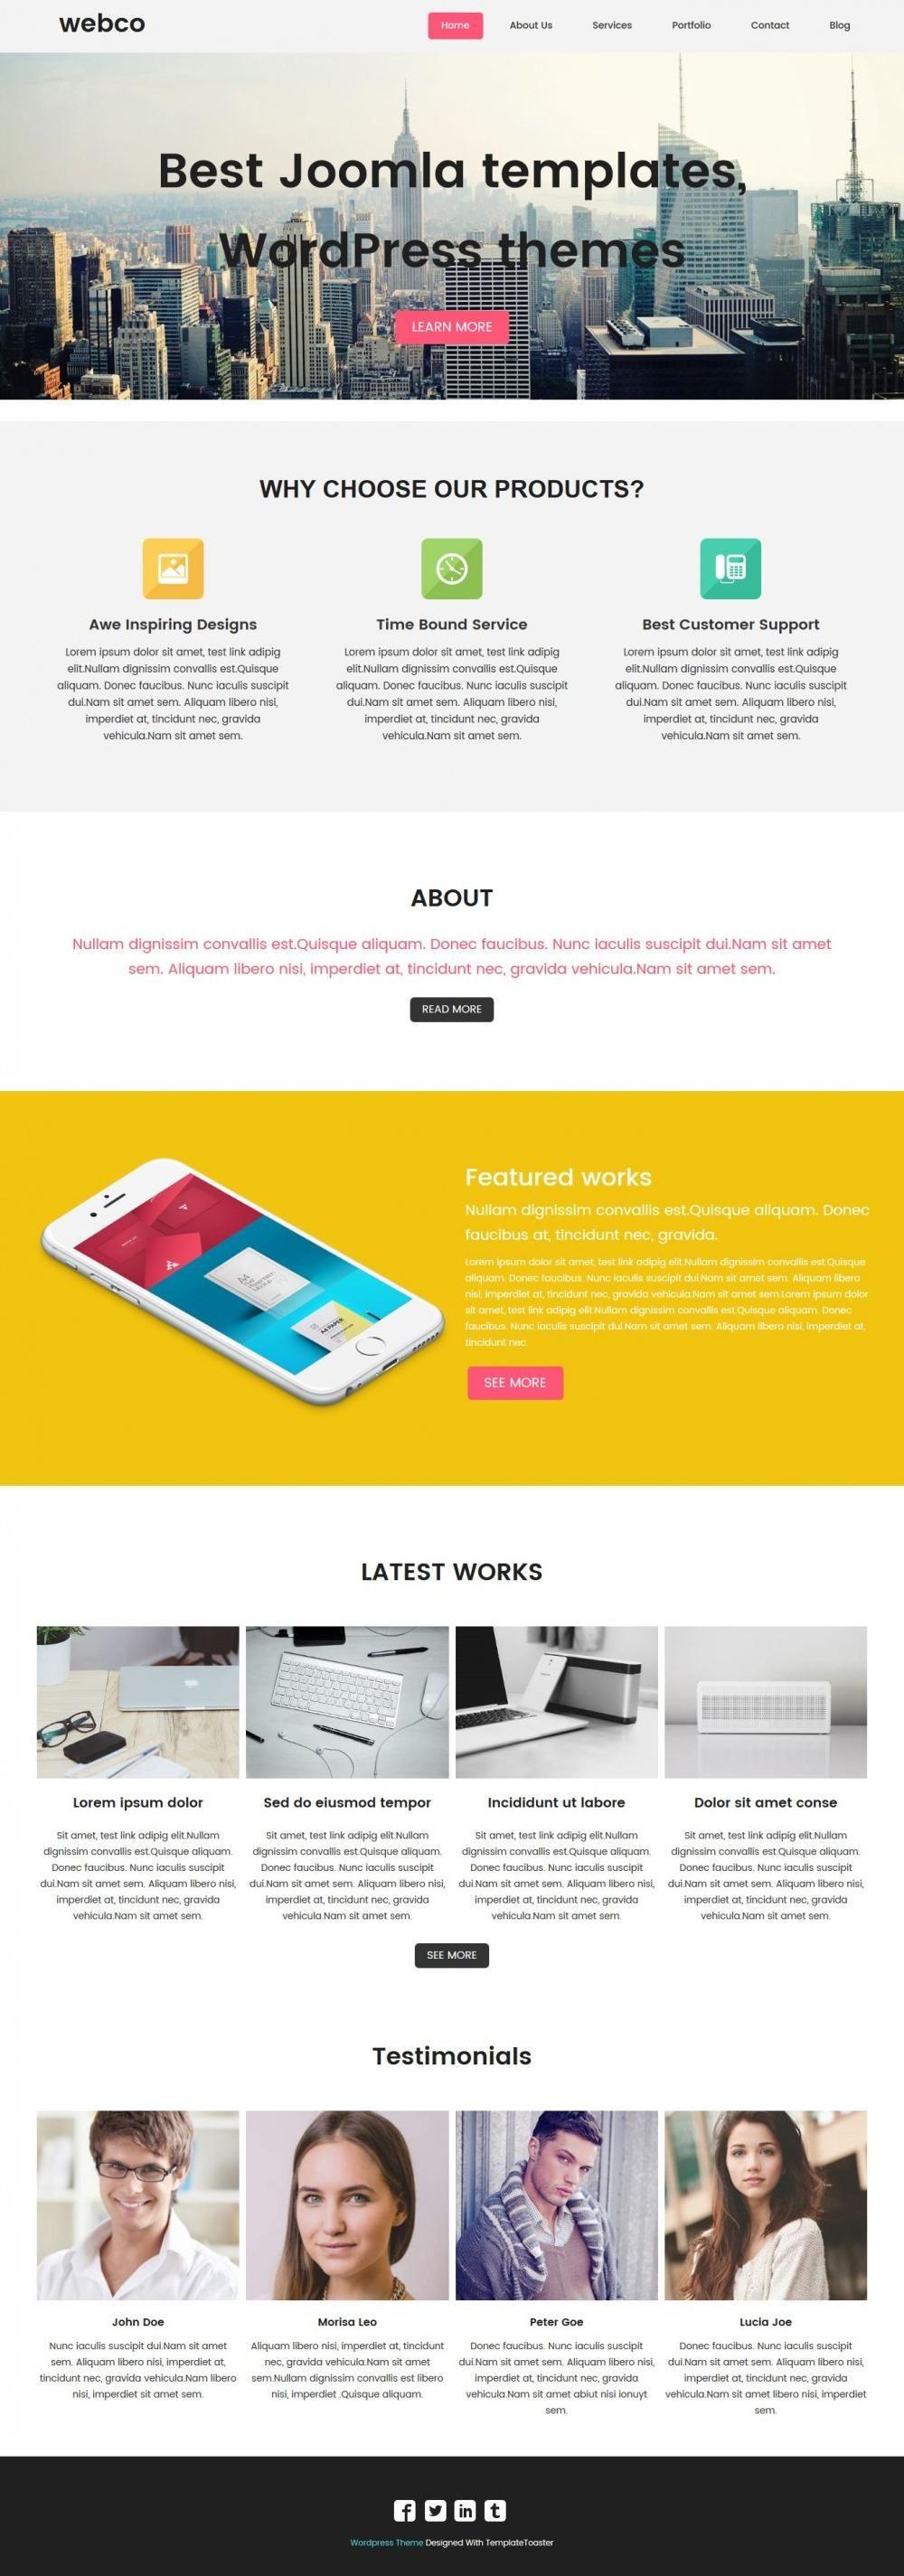 Webco - Free WordPress Theme For Web Design Agencies